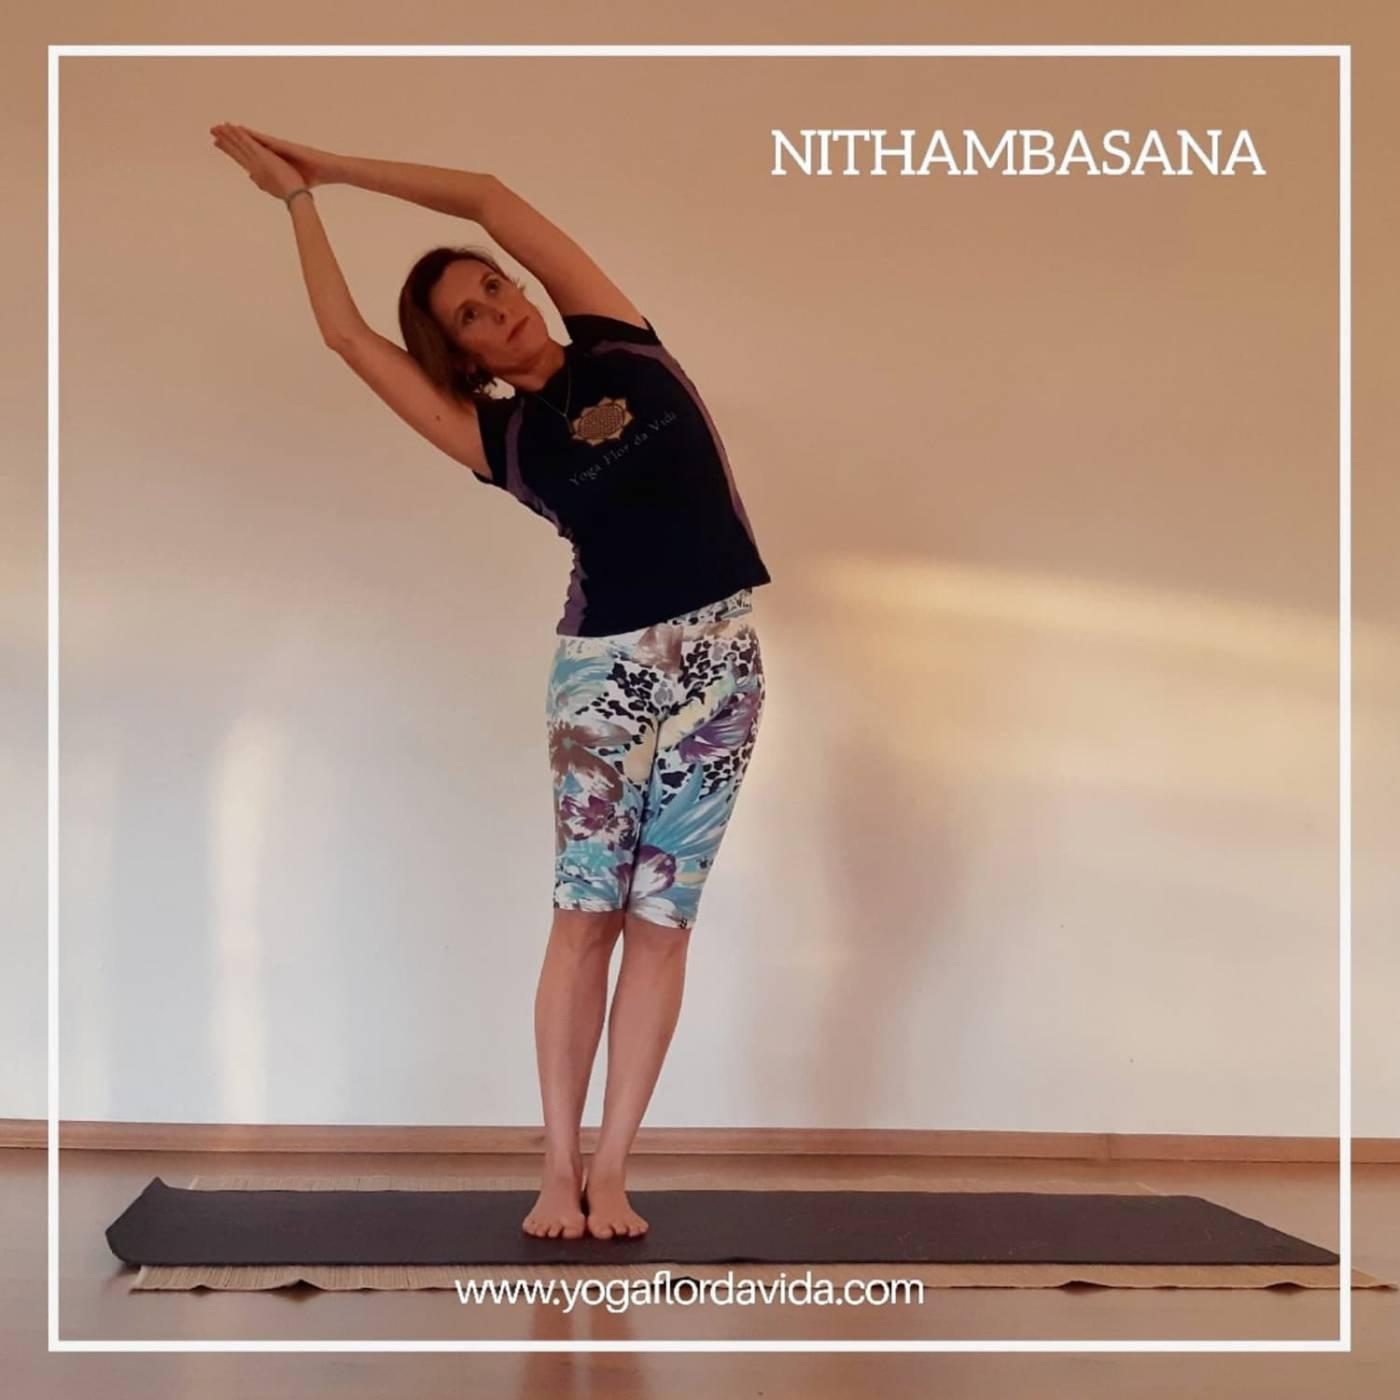 Nithambasana